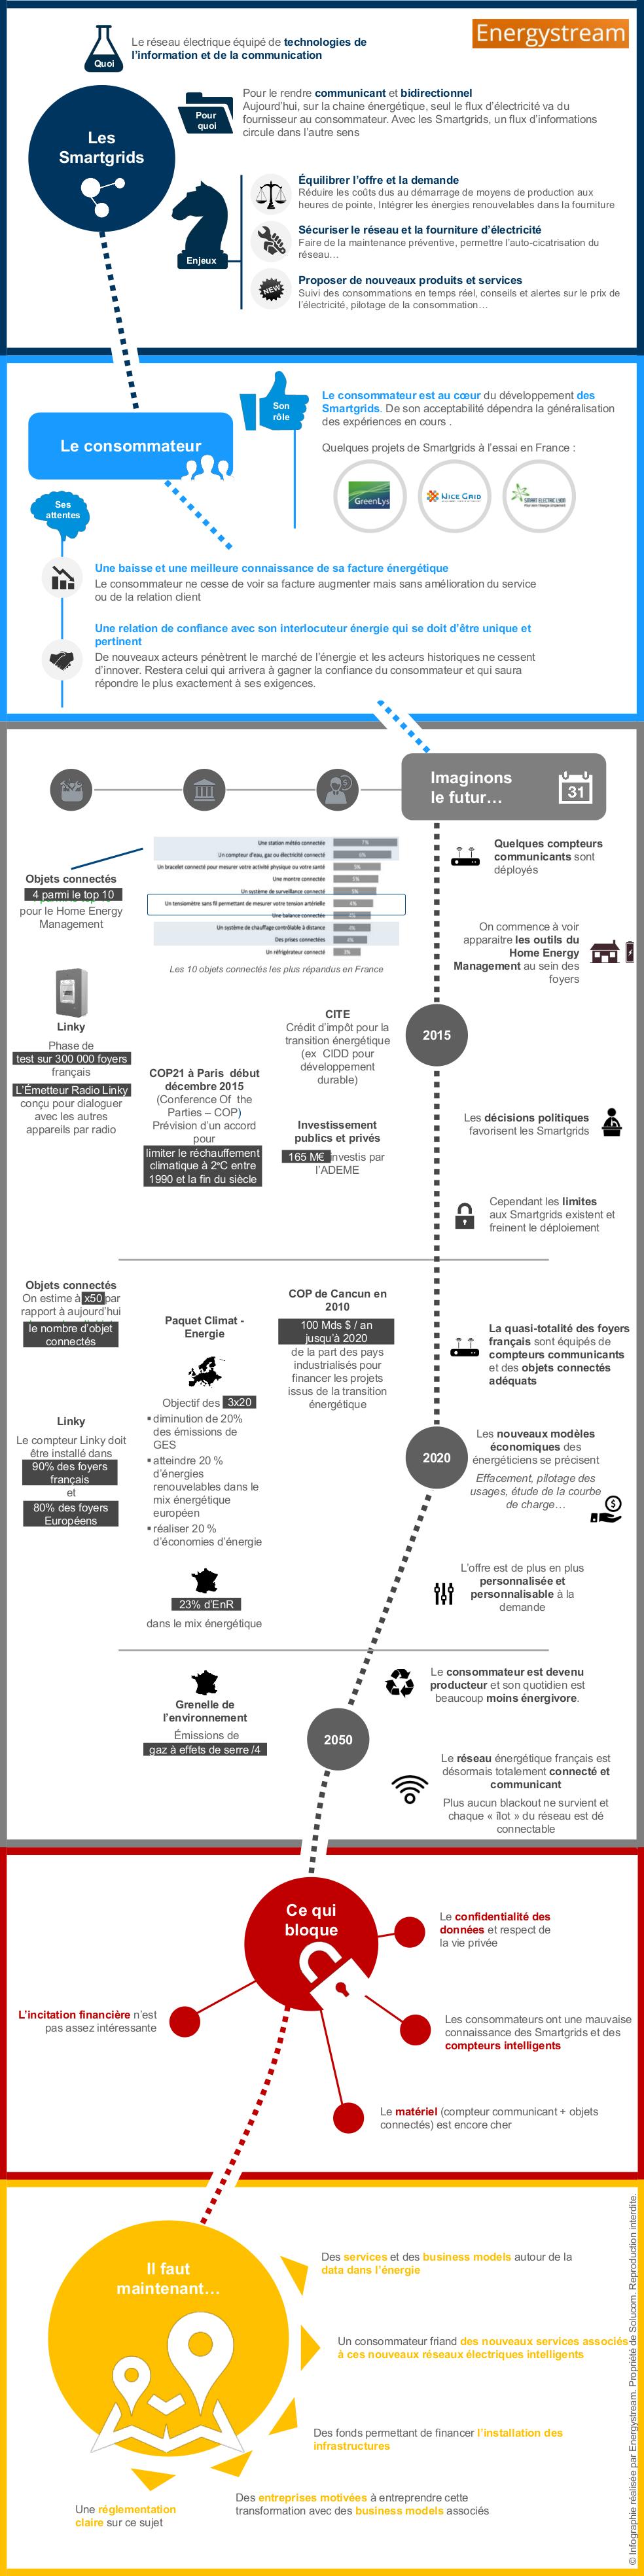 20150710_Energystream_Infographie_Smartgrids